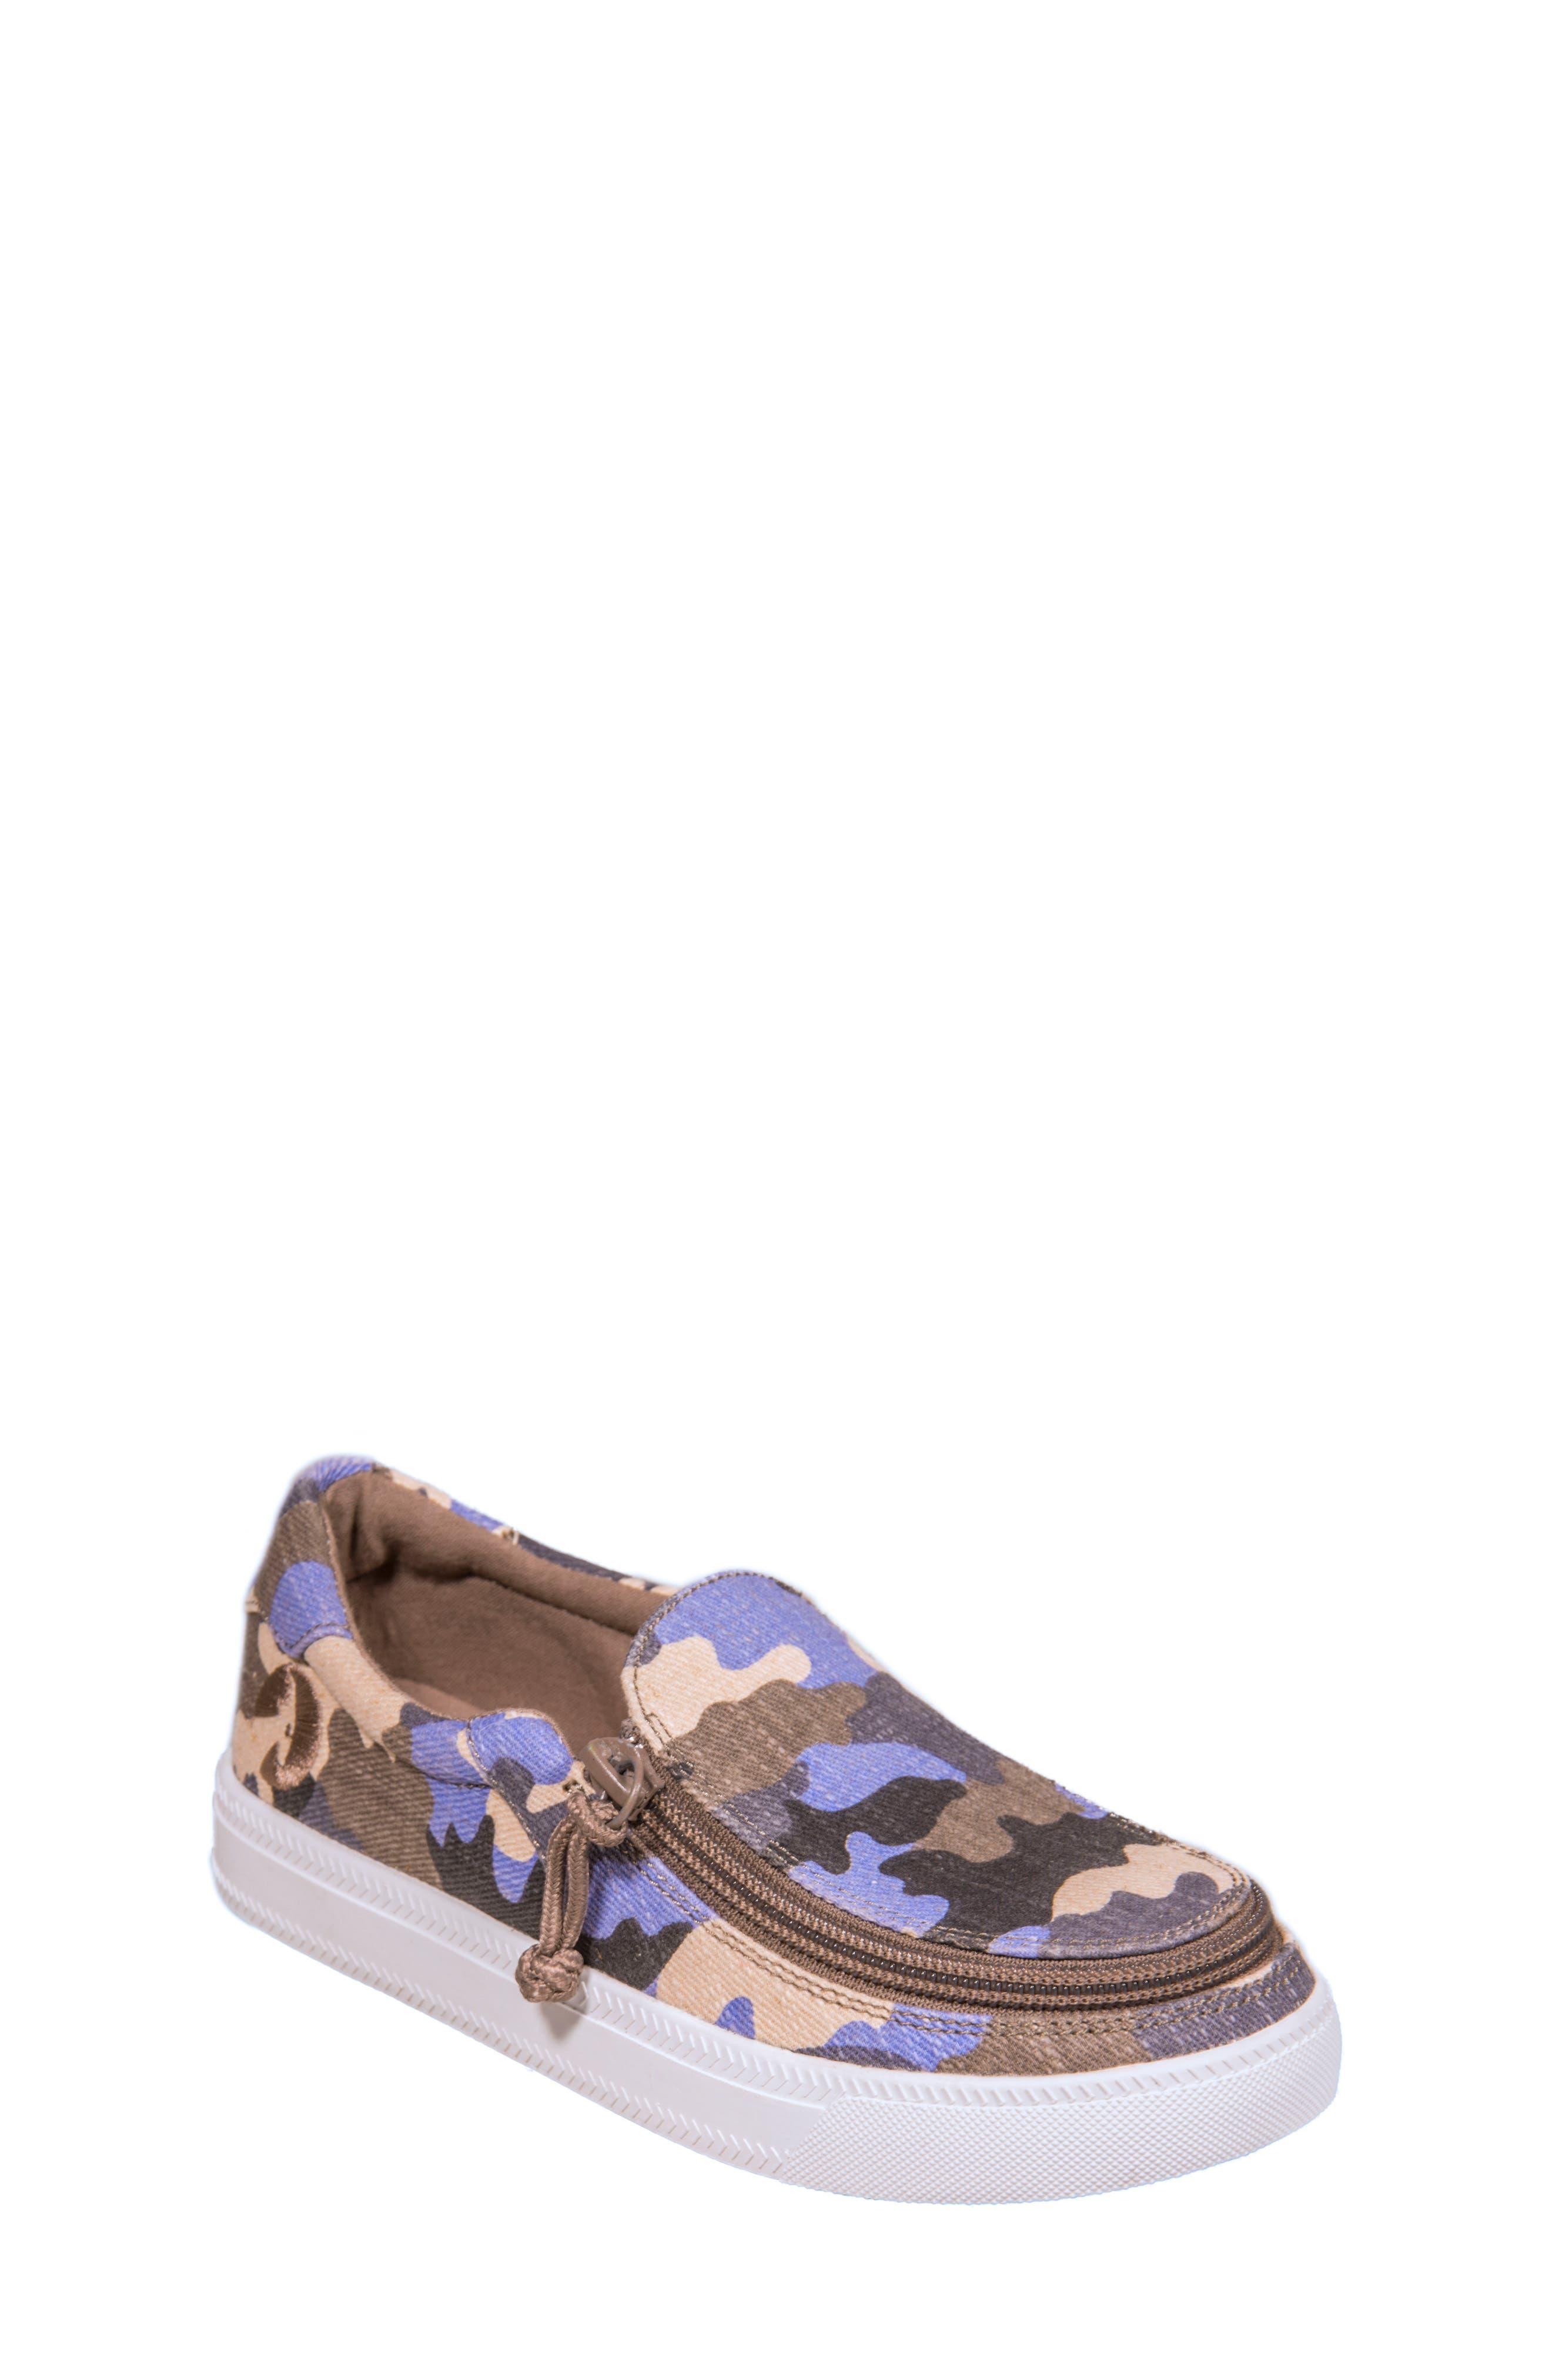 Zip Around Low Top Sneaker,                             Main thumbnail 1, color,                             440